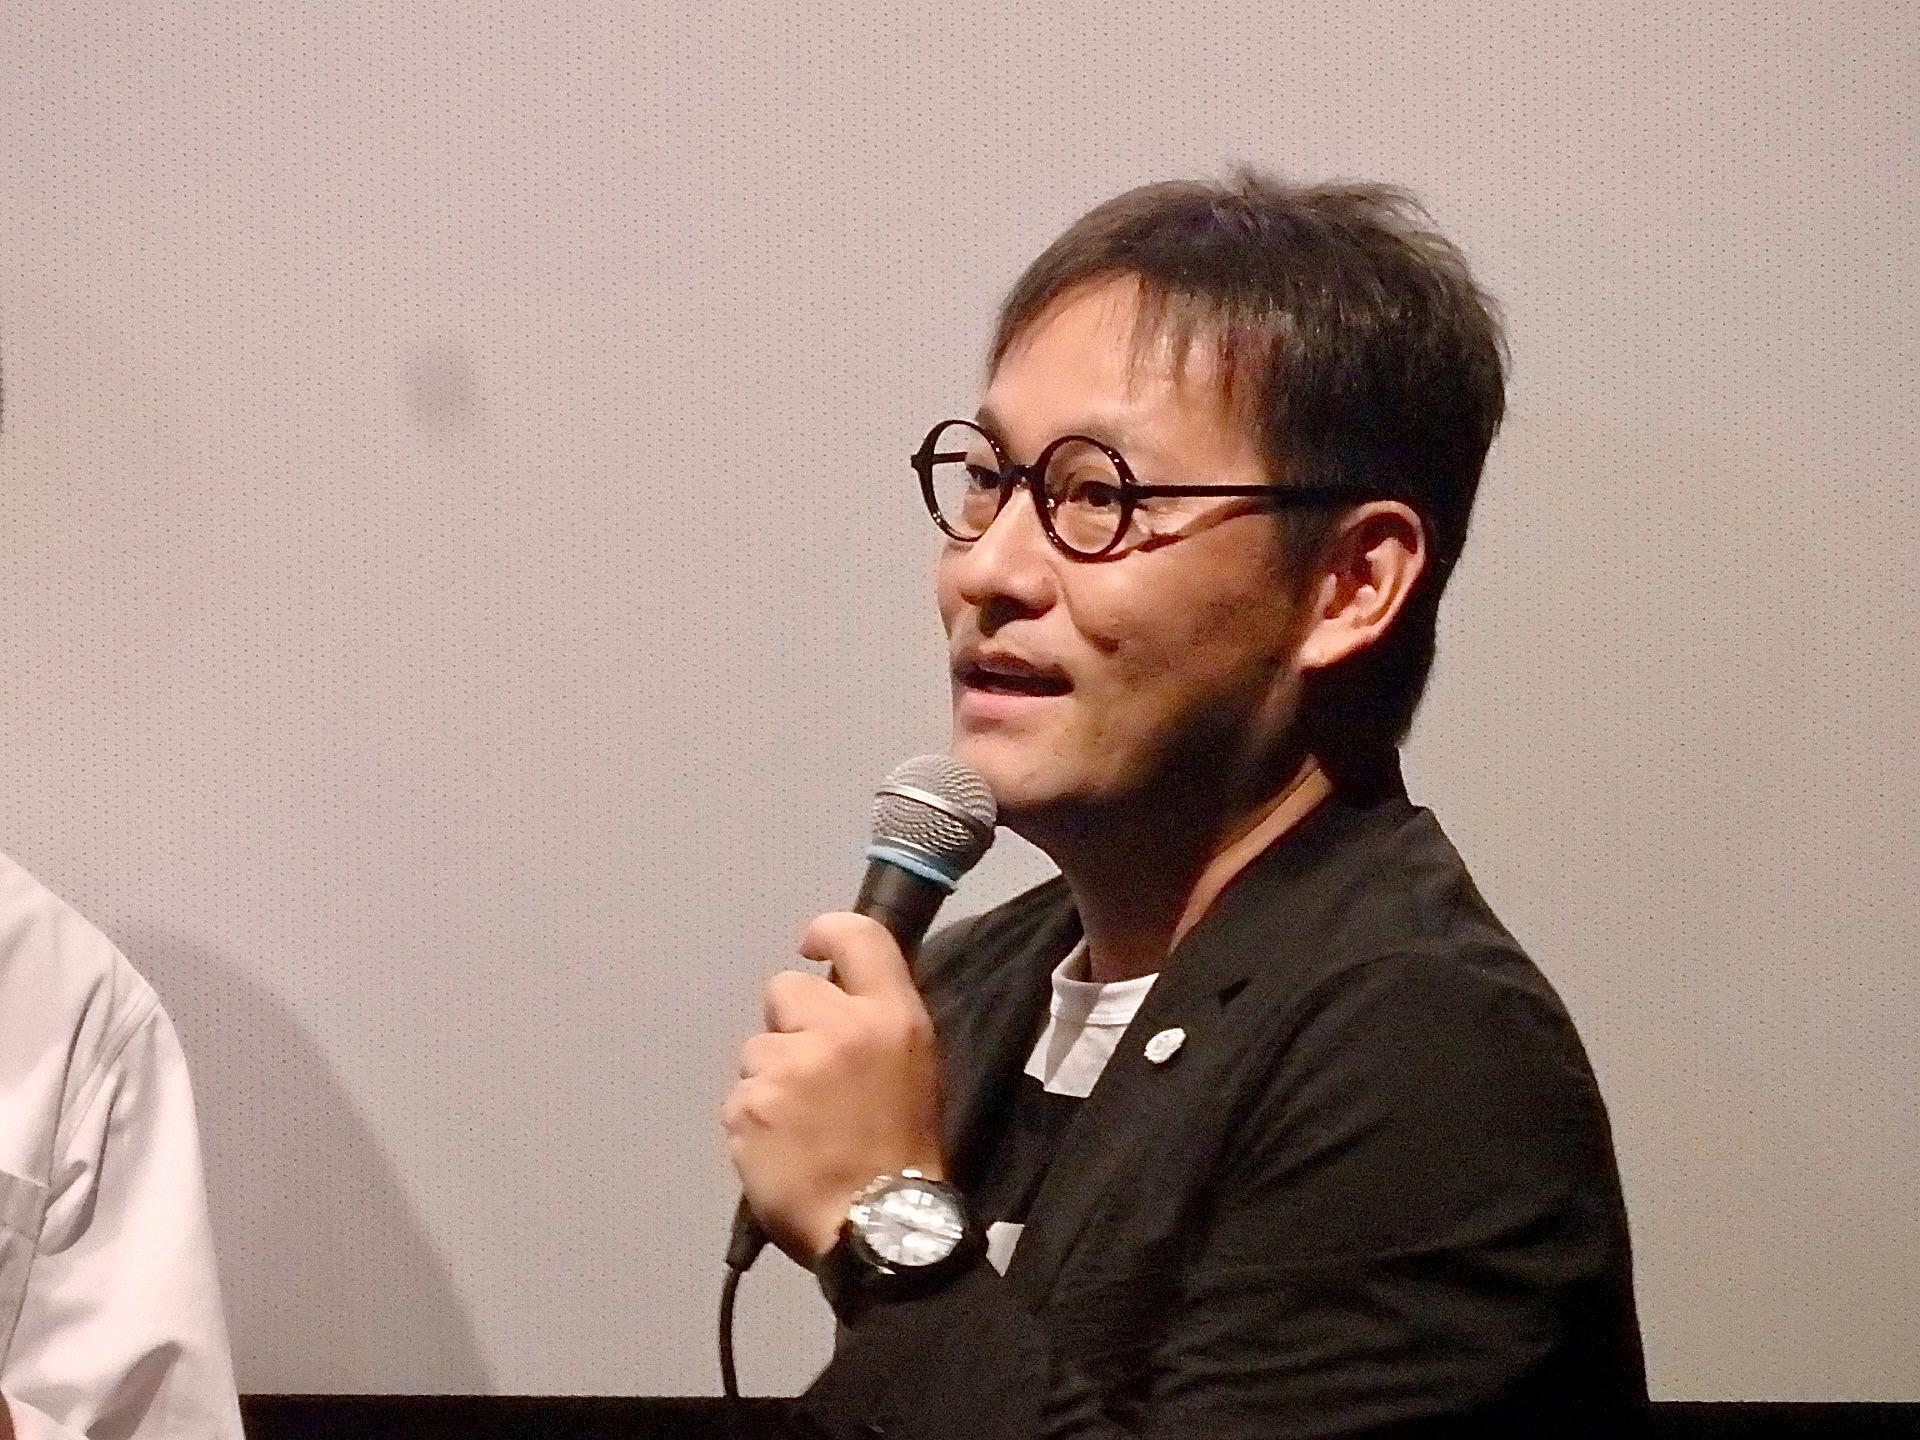 http://news.yoshimoto.co.jp/20171006133653-6ed75b526825fc5c41da9dfdc3efd8313a8787a9.jpg